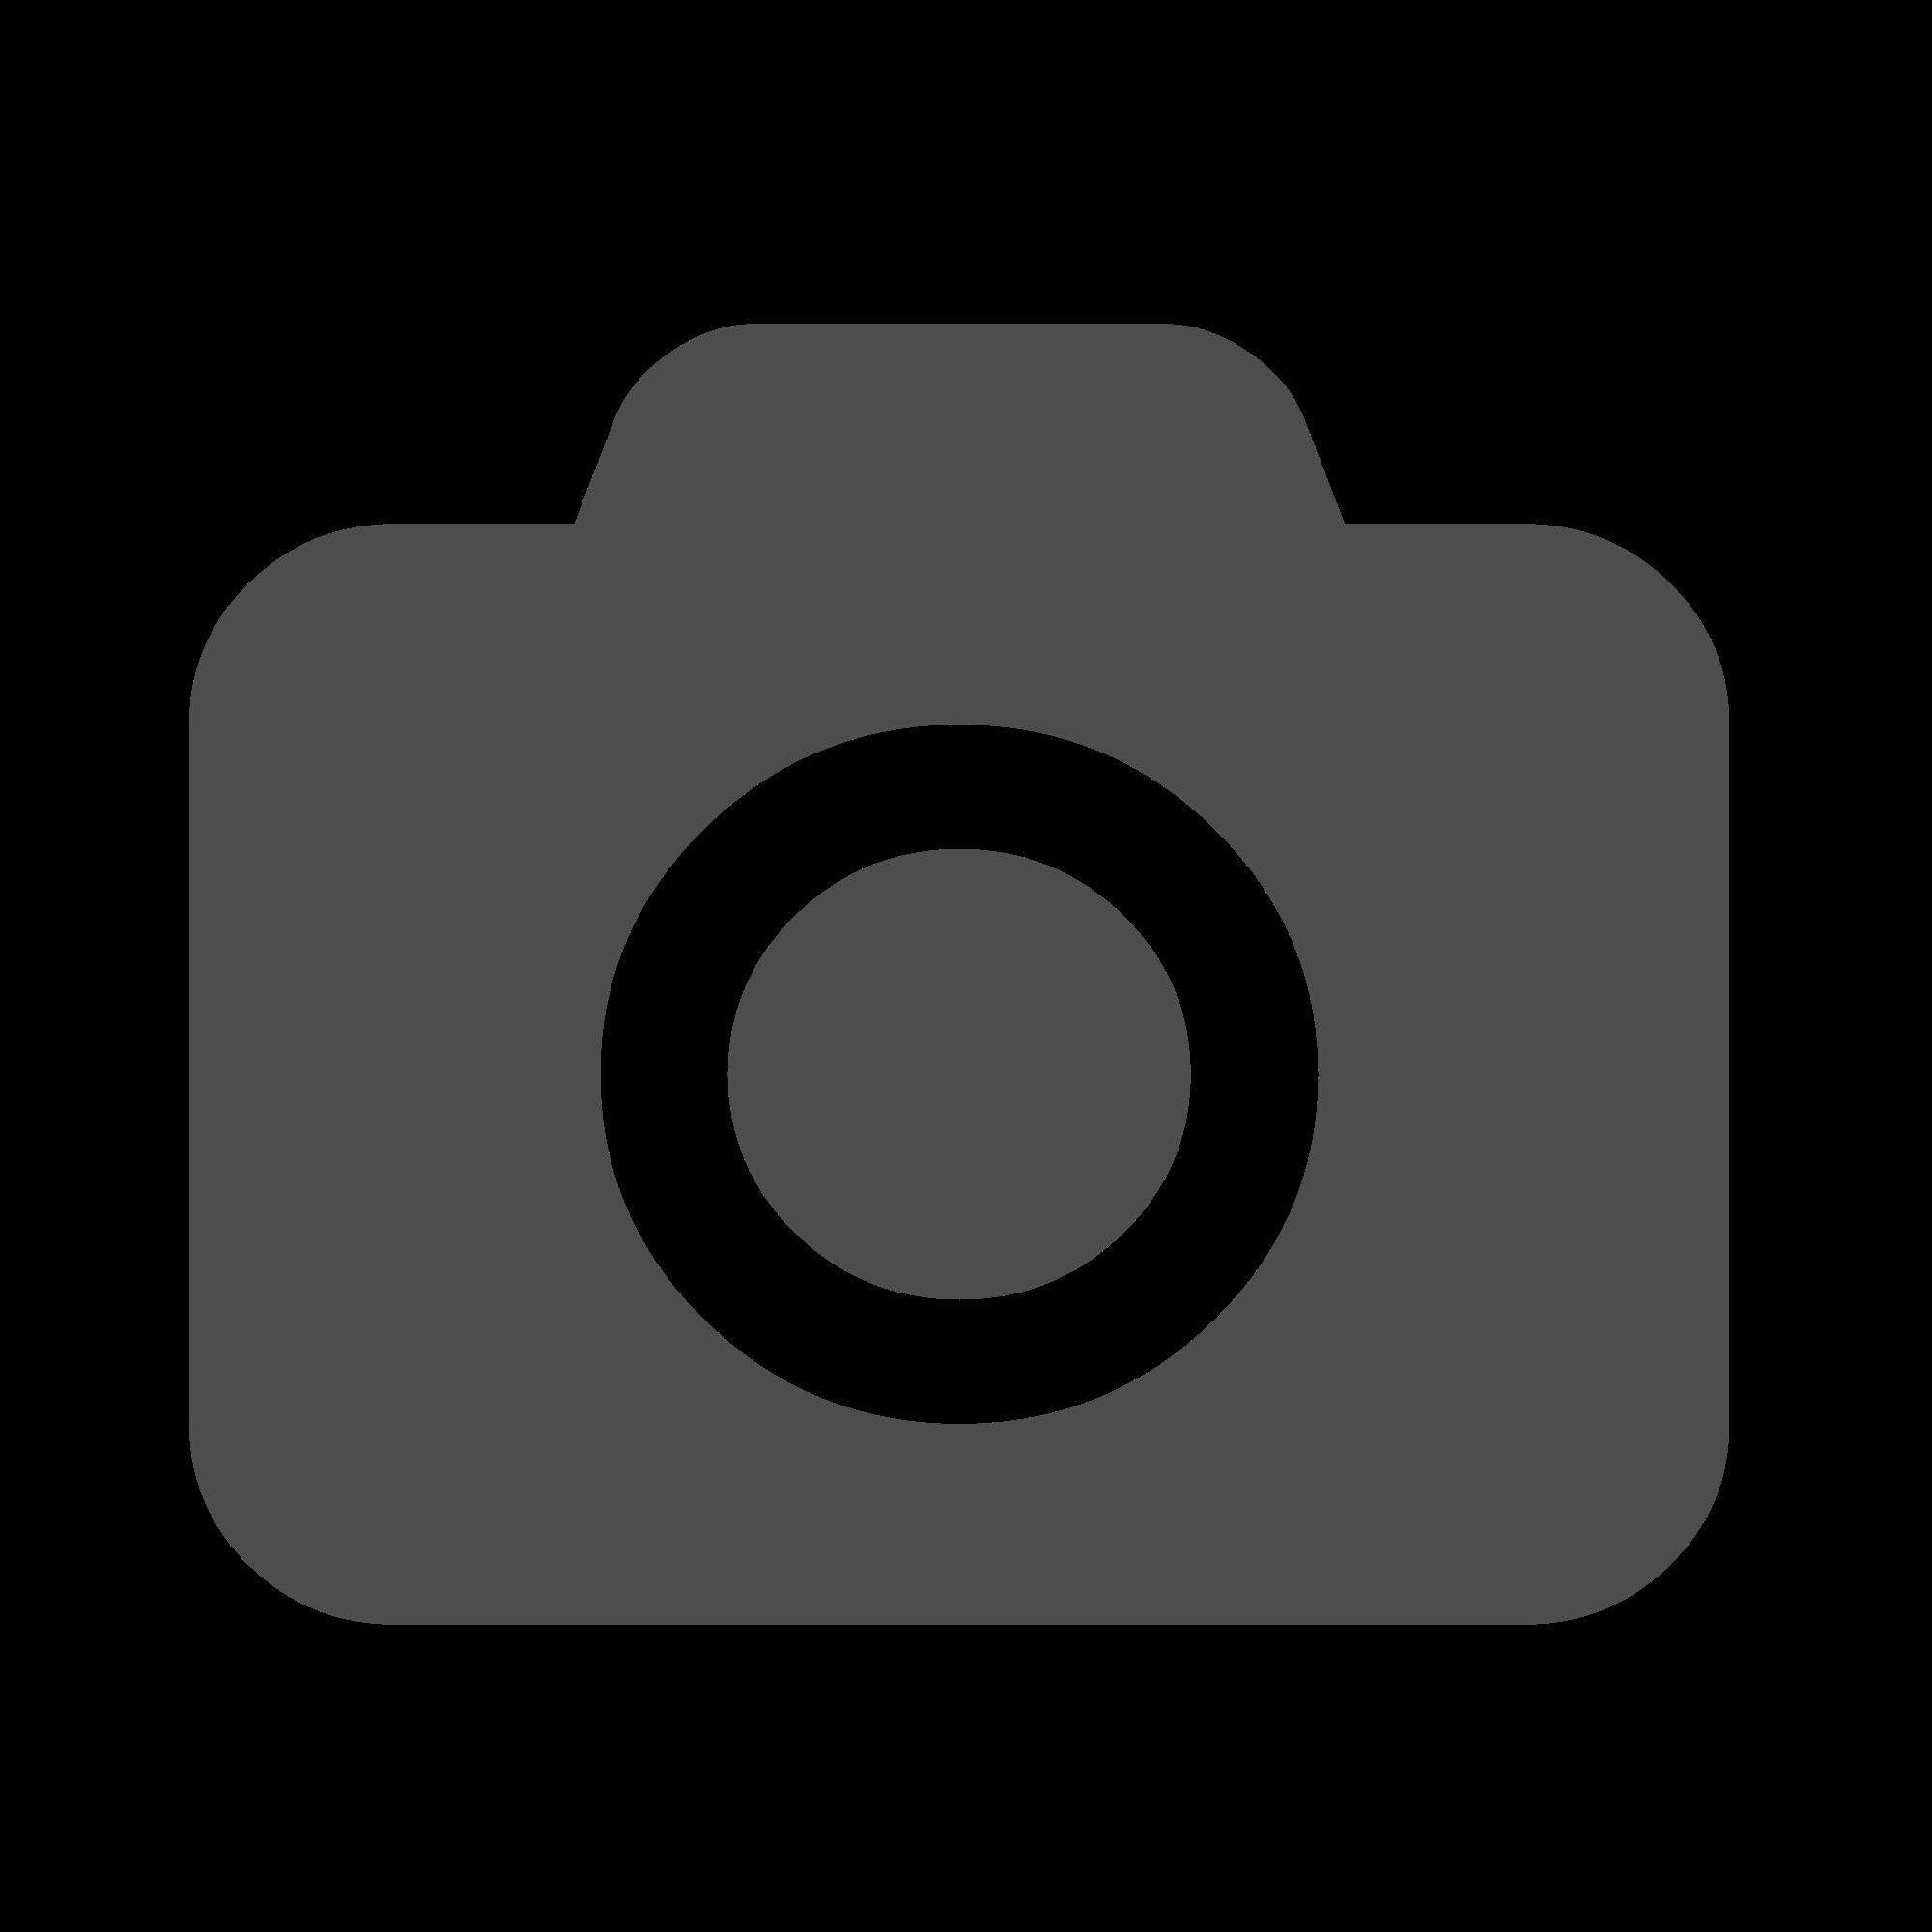 Instagram instagram camera